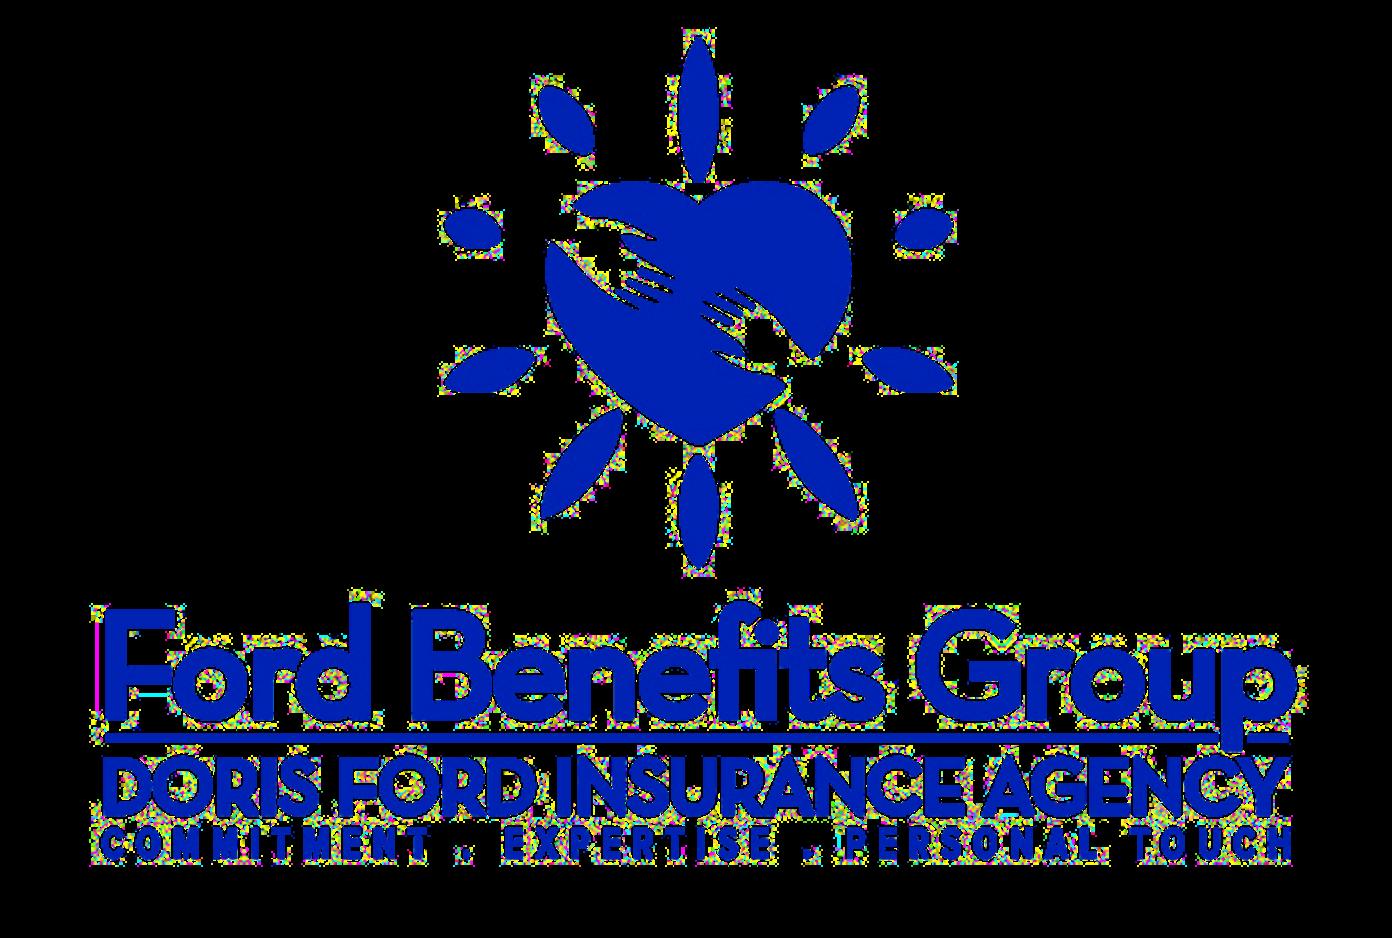 Group Health Insurance for California Retina Logo